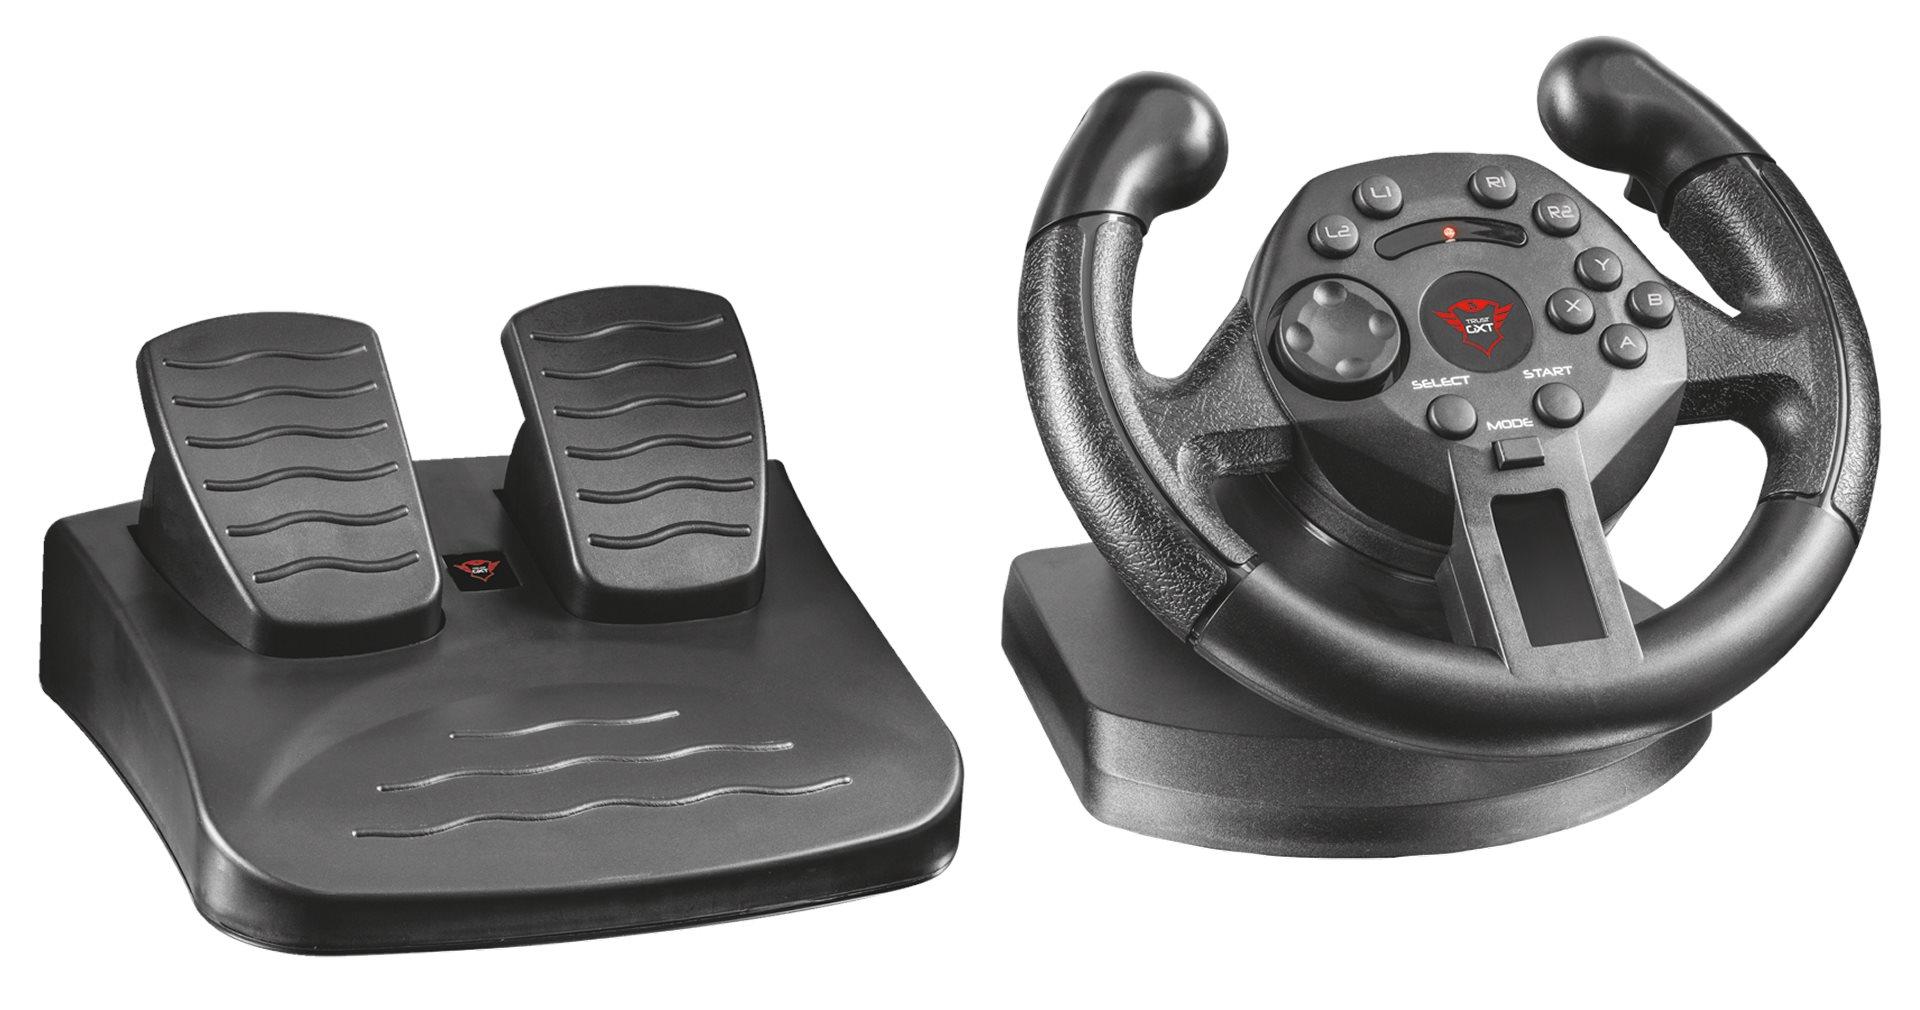 atc market volant trust gxt 570 compact vibration racing. Black Bedroom Furniture Sets. Home Design Ideas